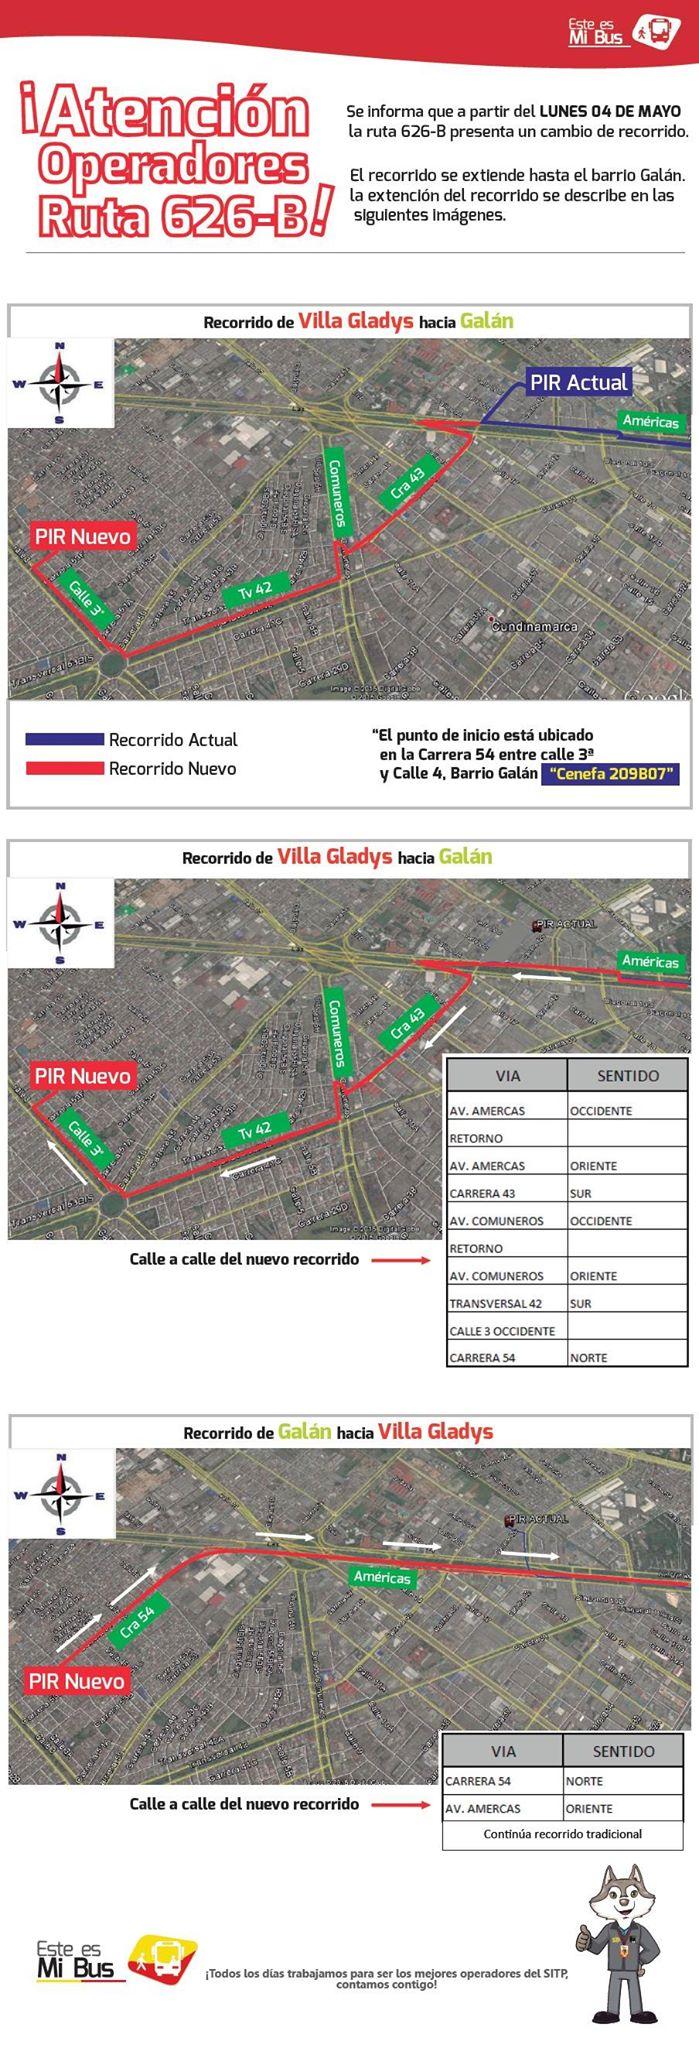 Extendida ruta 626B hasta el barrio Galán